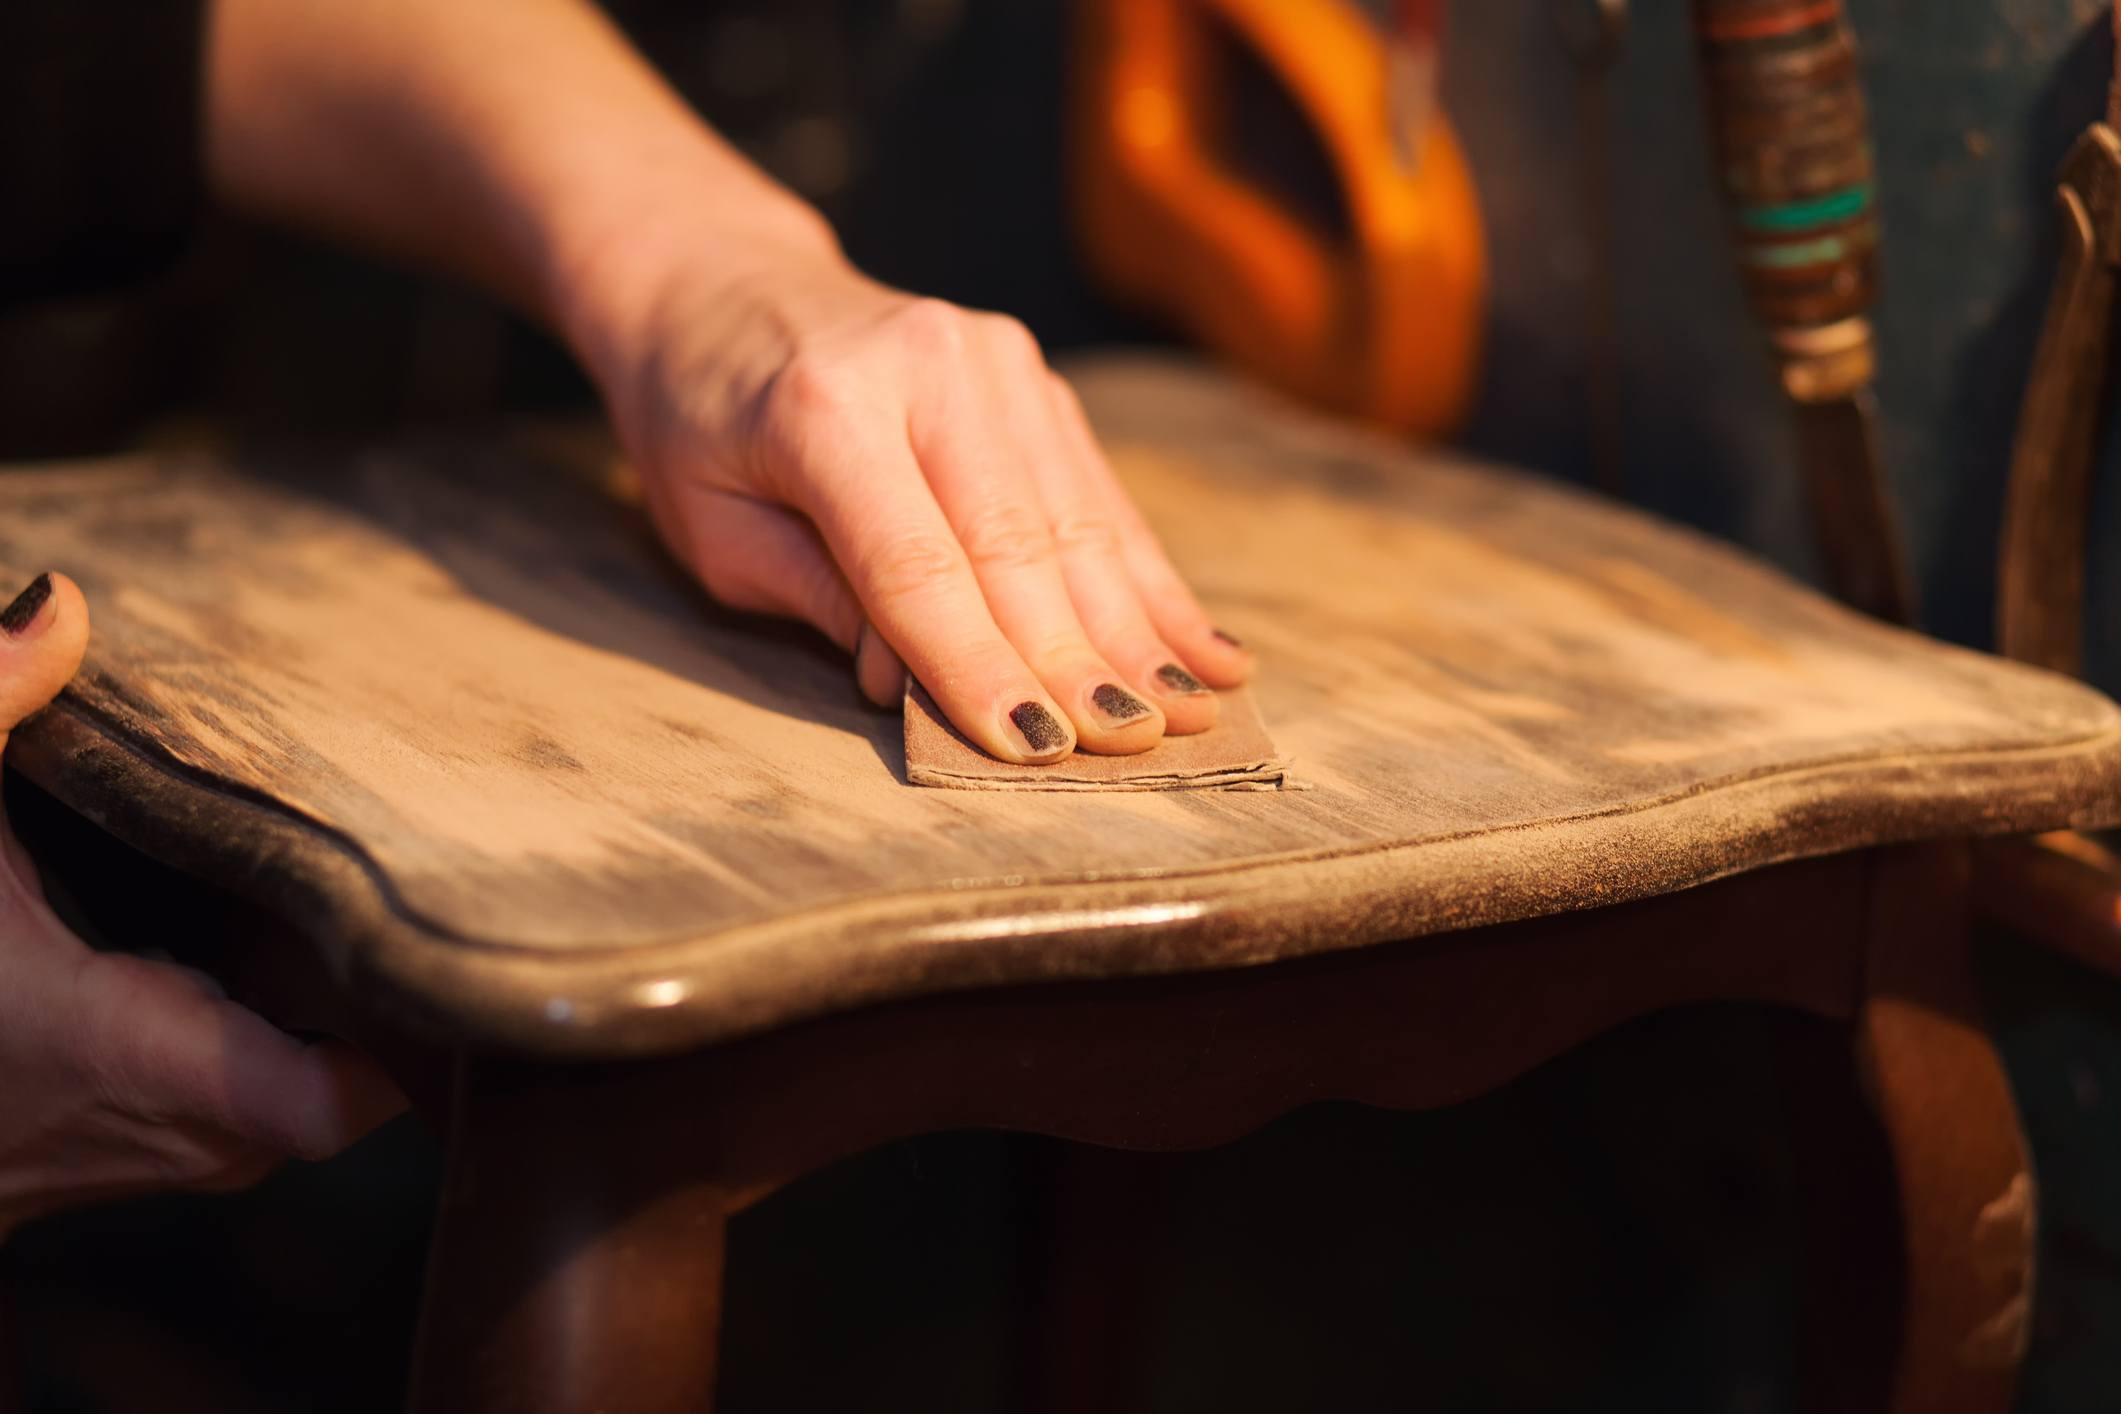 sanding wood table